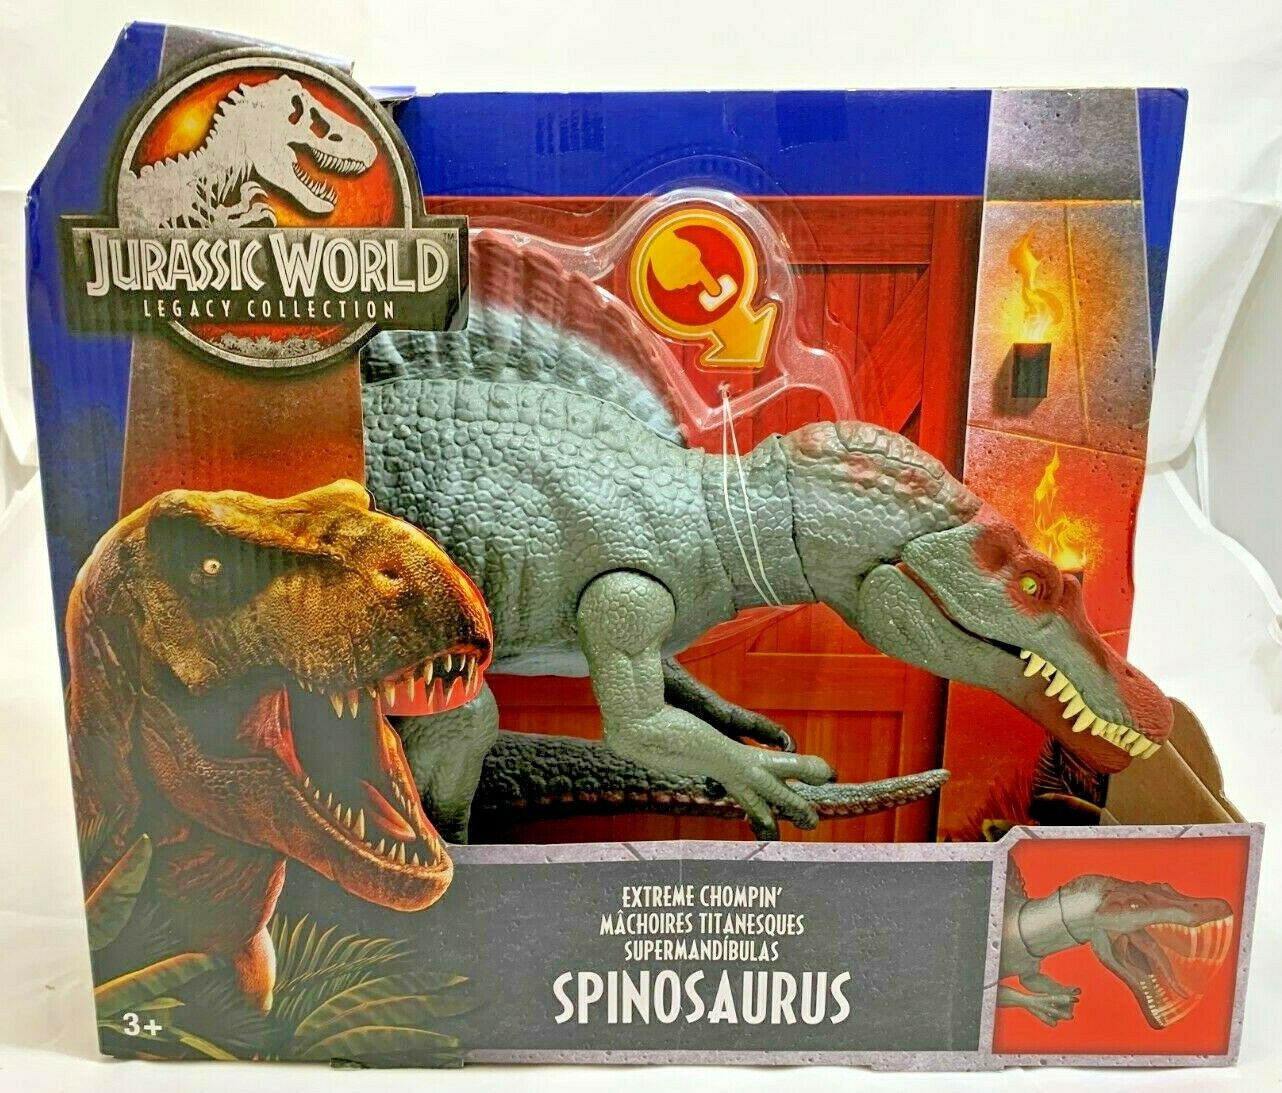 HTF MATTEL JURASSIC WORLD Legacy Collection Extreme Chompin SPINOSAURUS Dinosaur